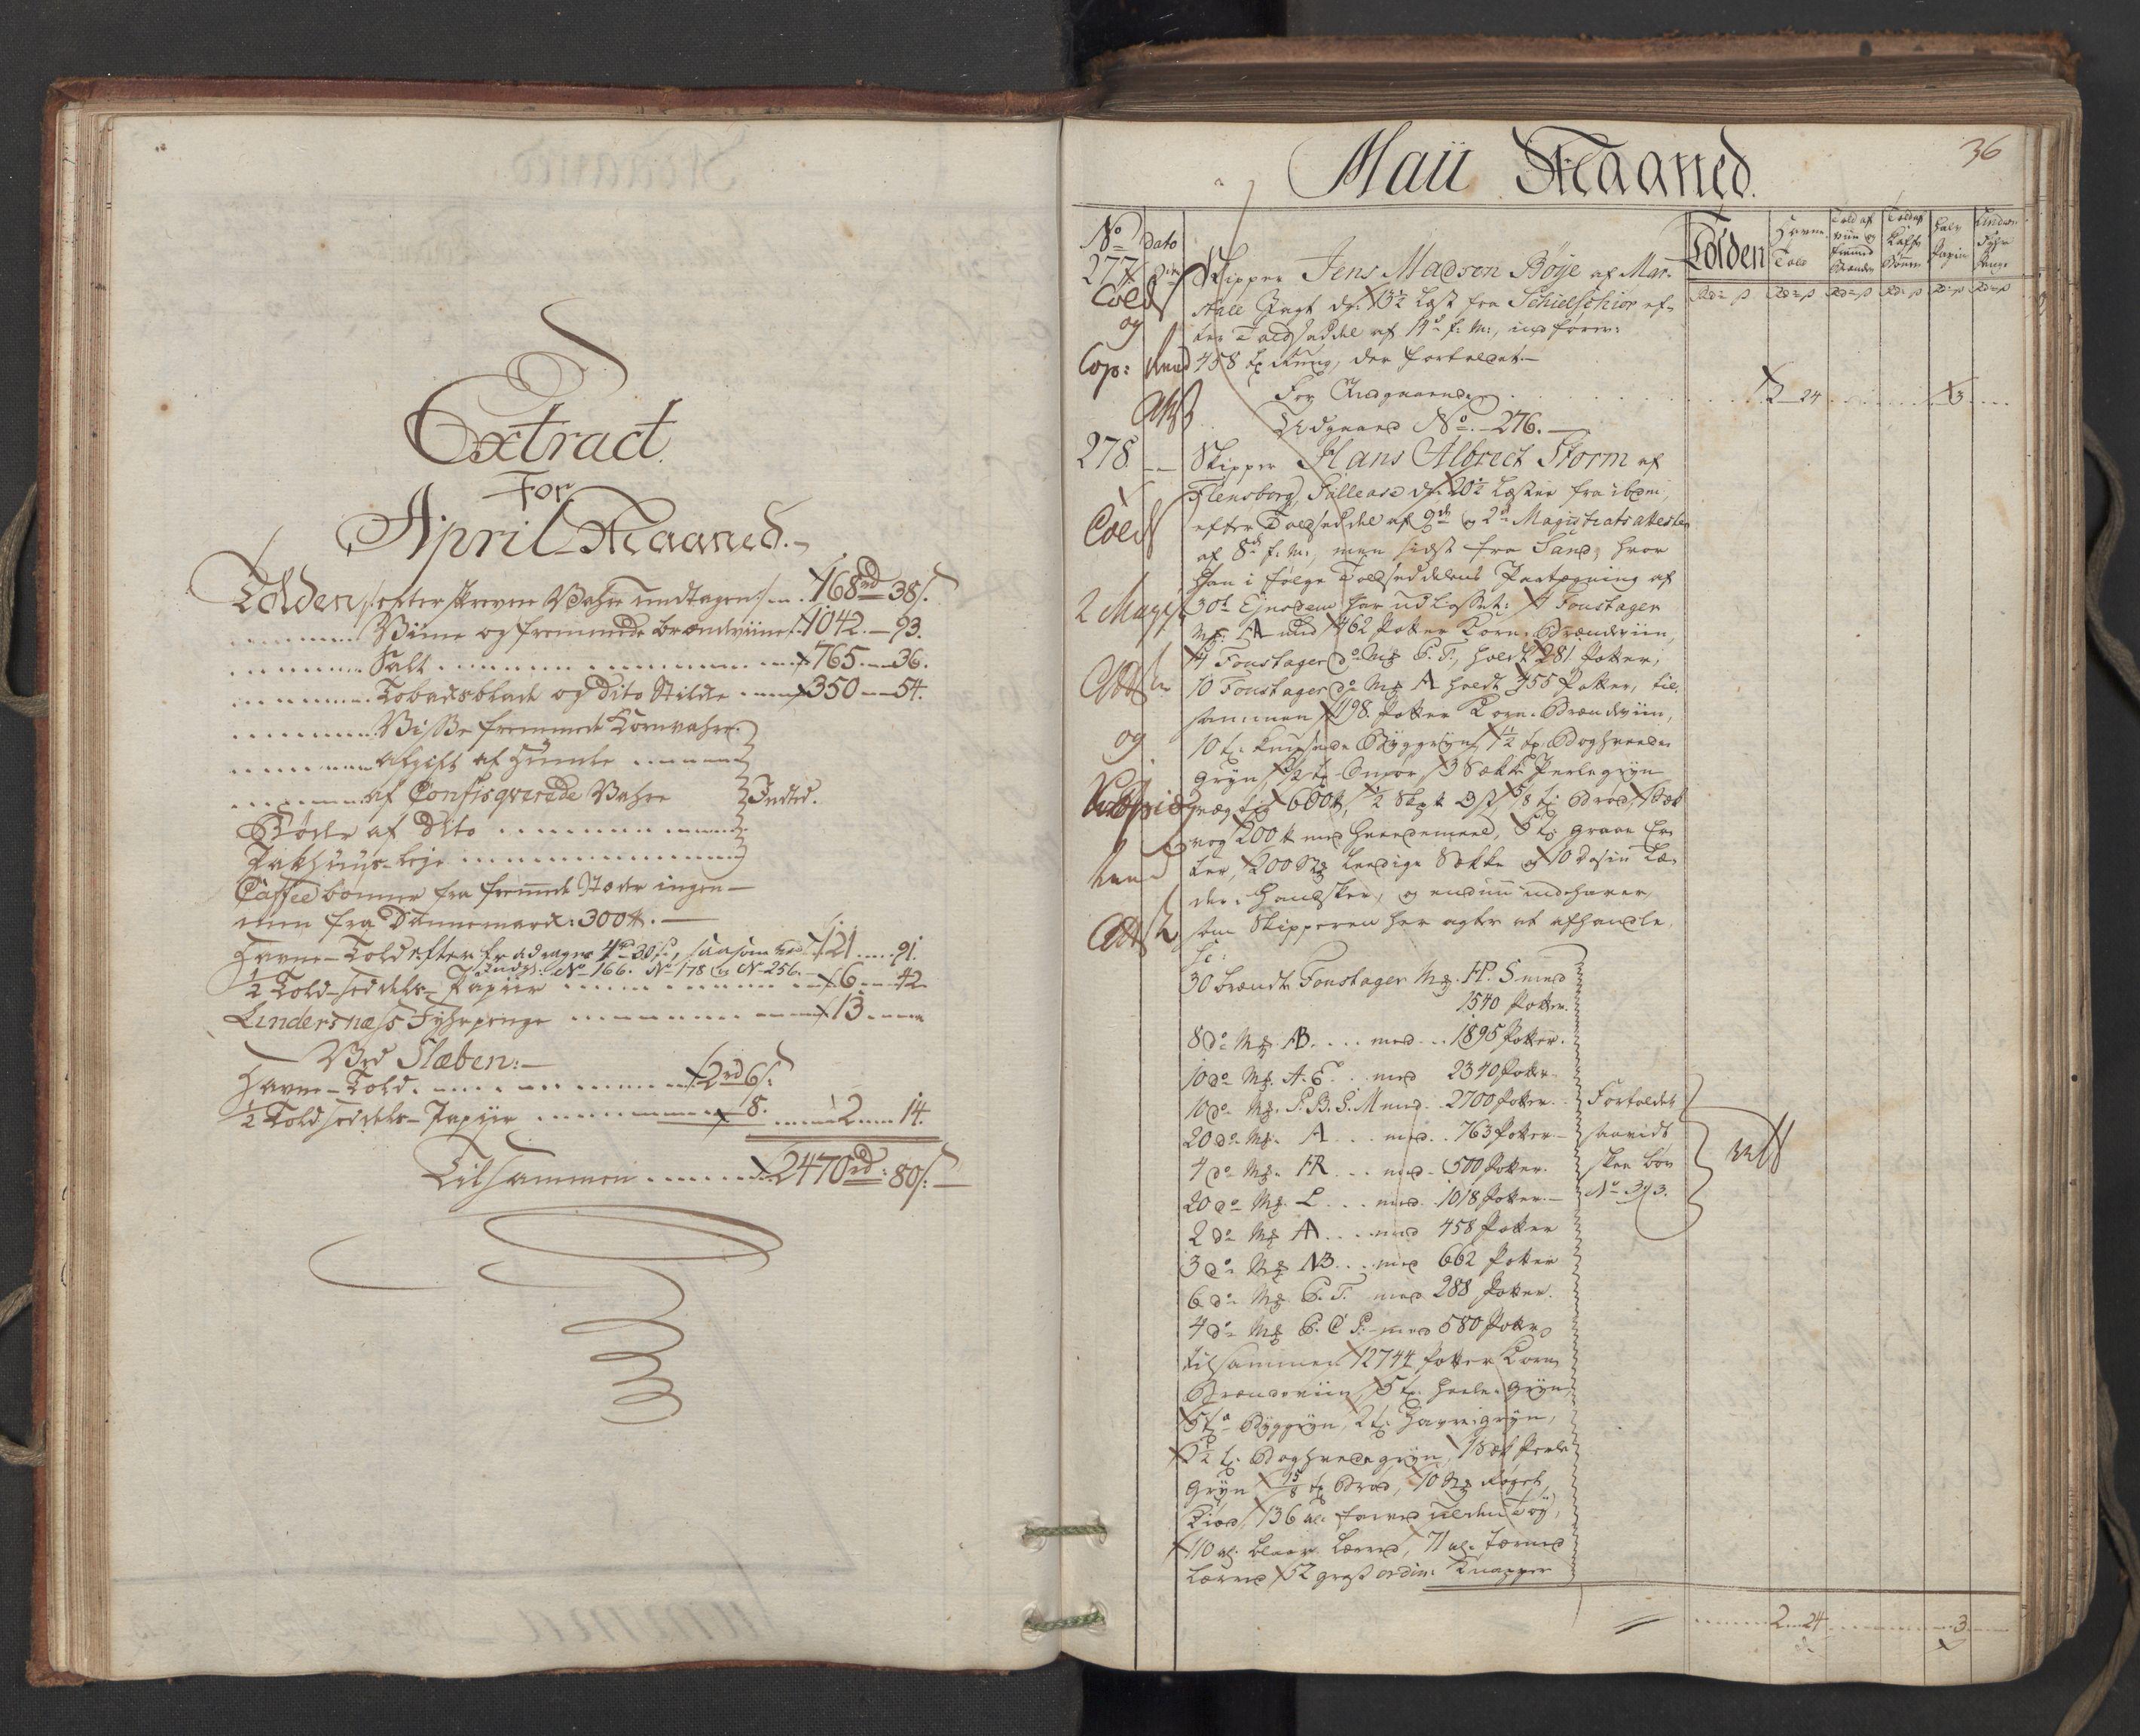 RA, Generaltollkammeret, tollregnskaper, R06/L0173: Tollregnskaper Kristiania, 1788, s. 35b-36a